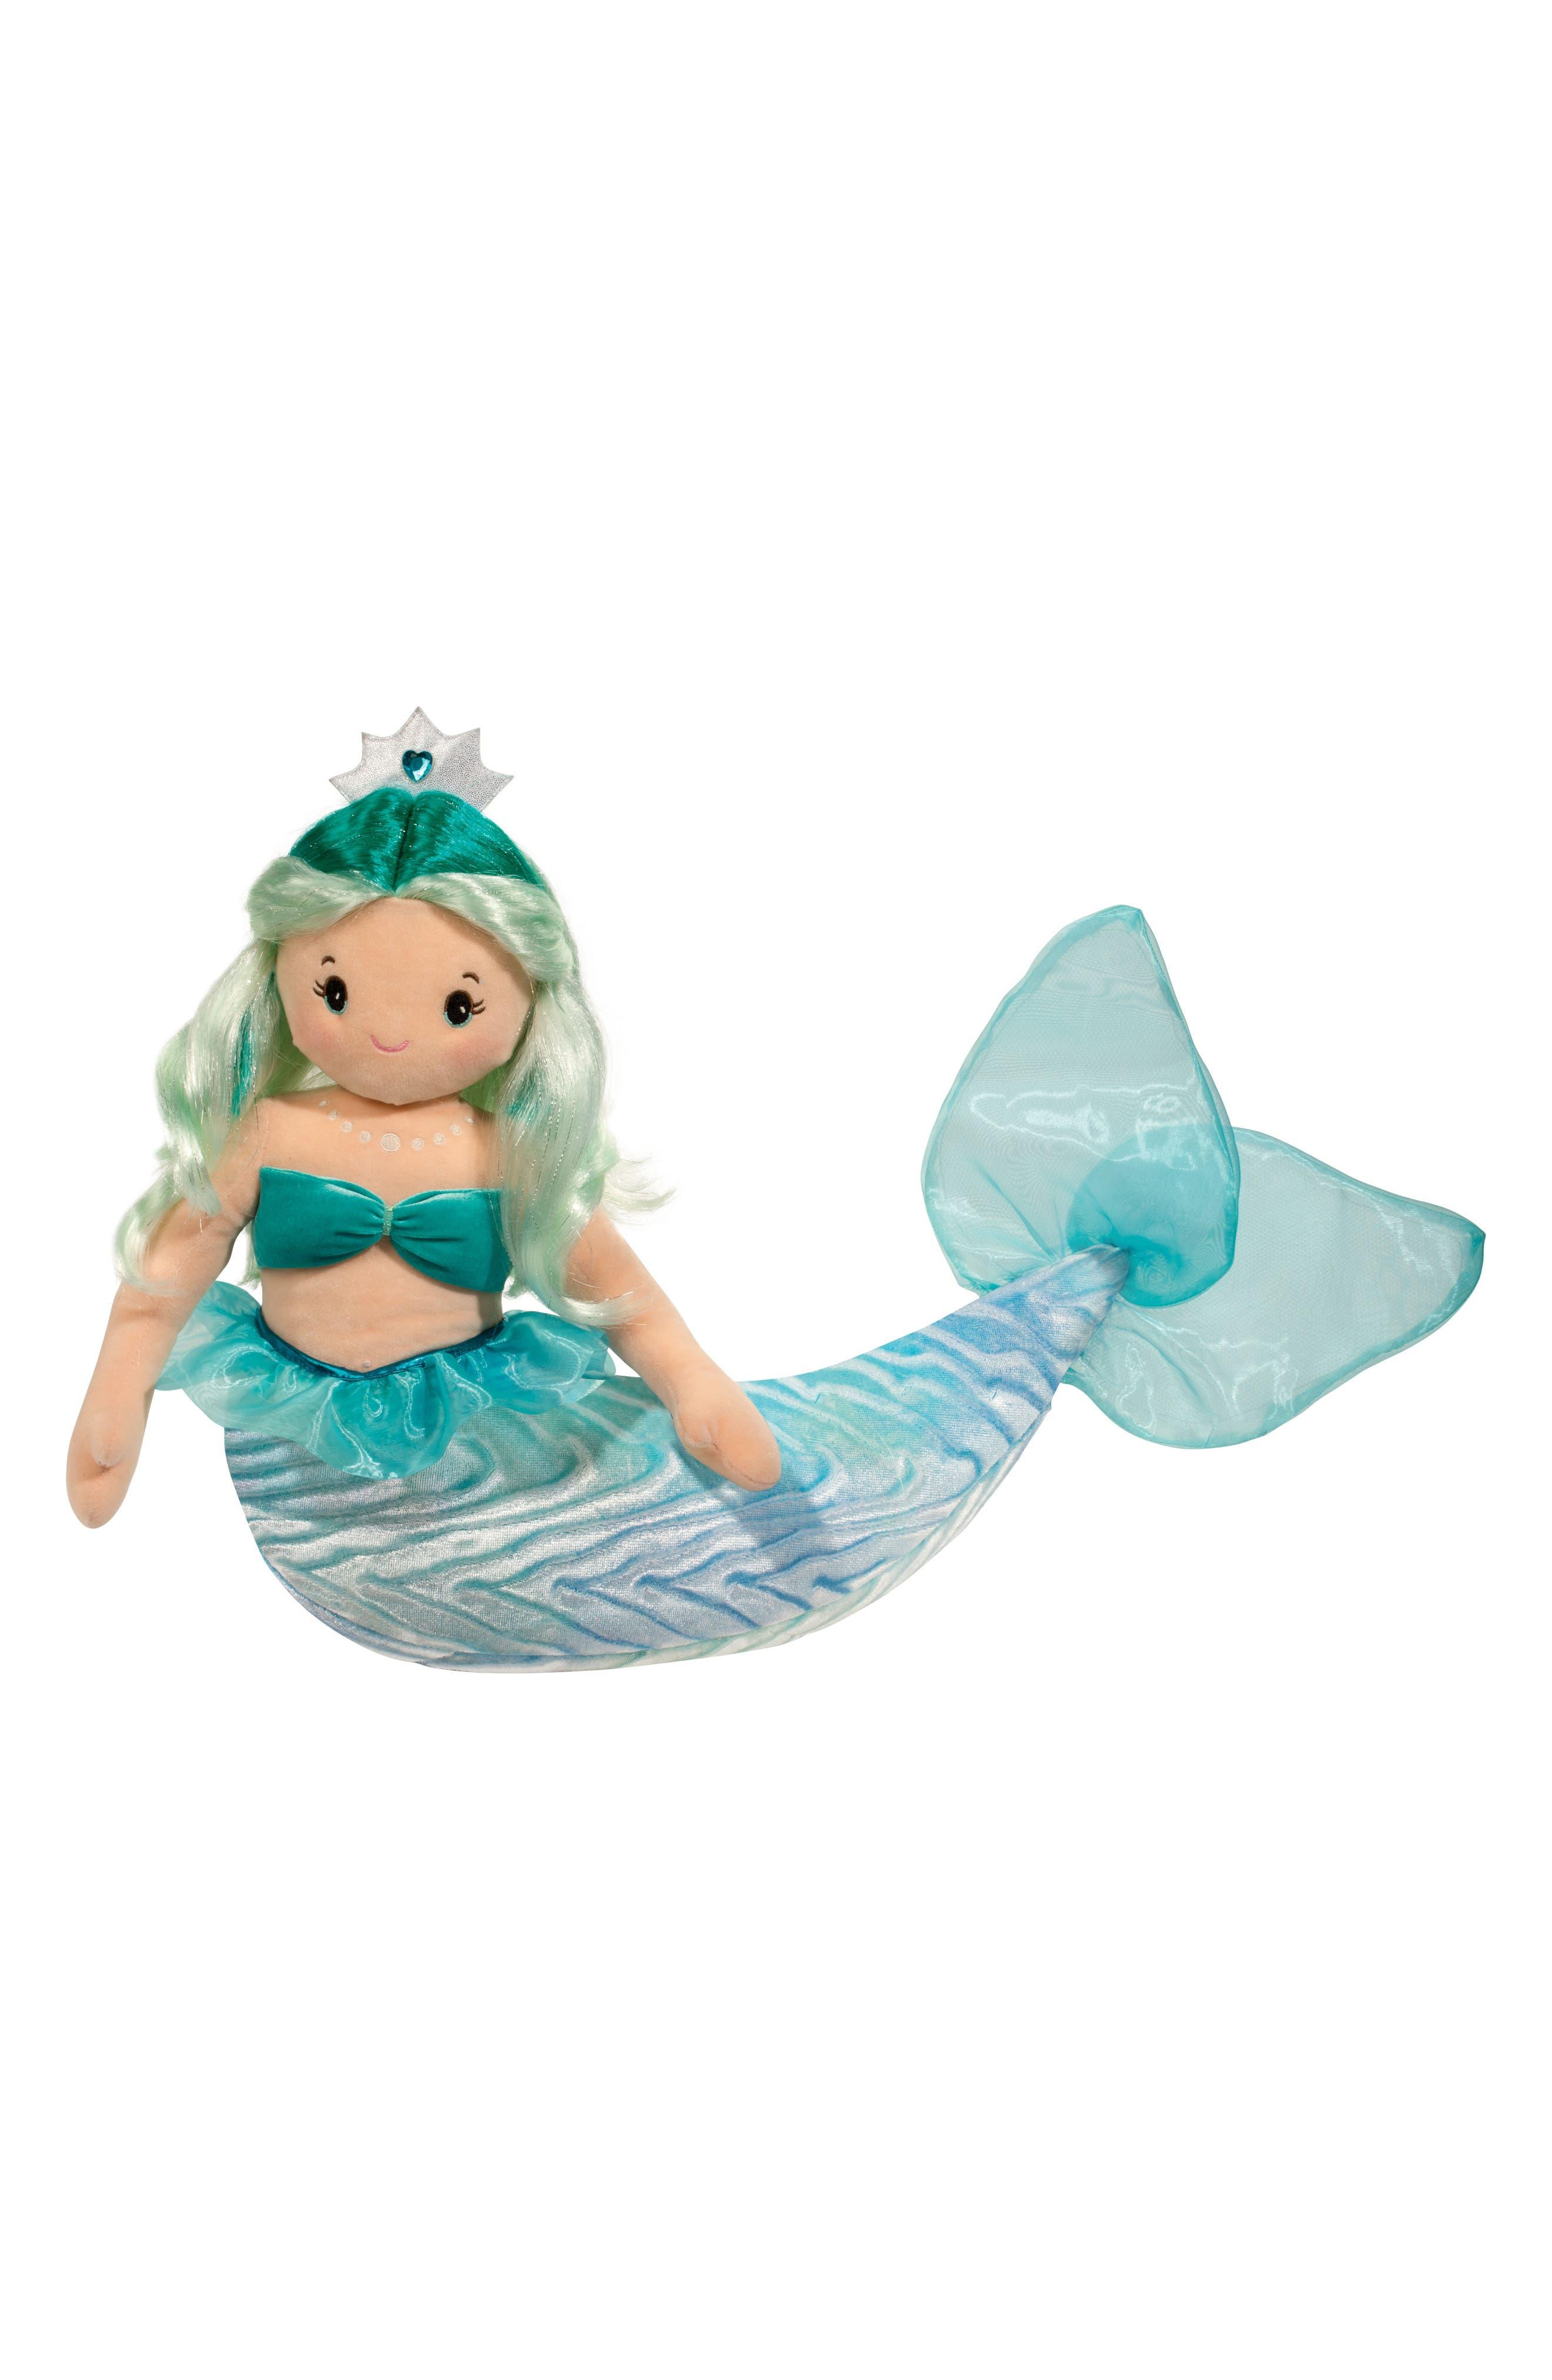 Ciara - Extra Large Aqua Mermaid Doll,                             Main thumbnail 1, color,